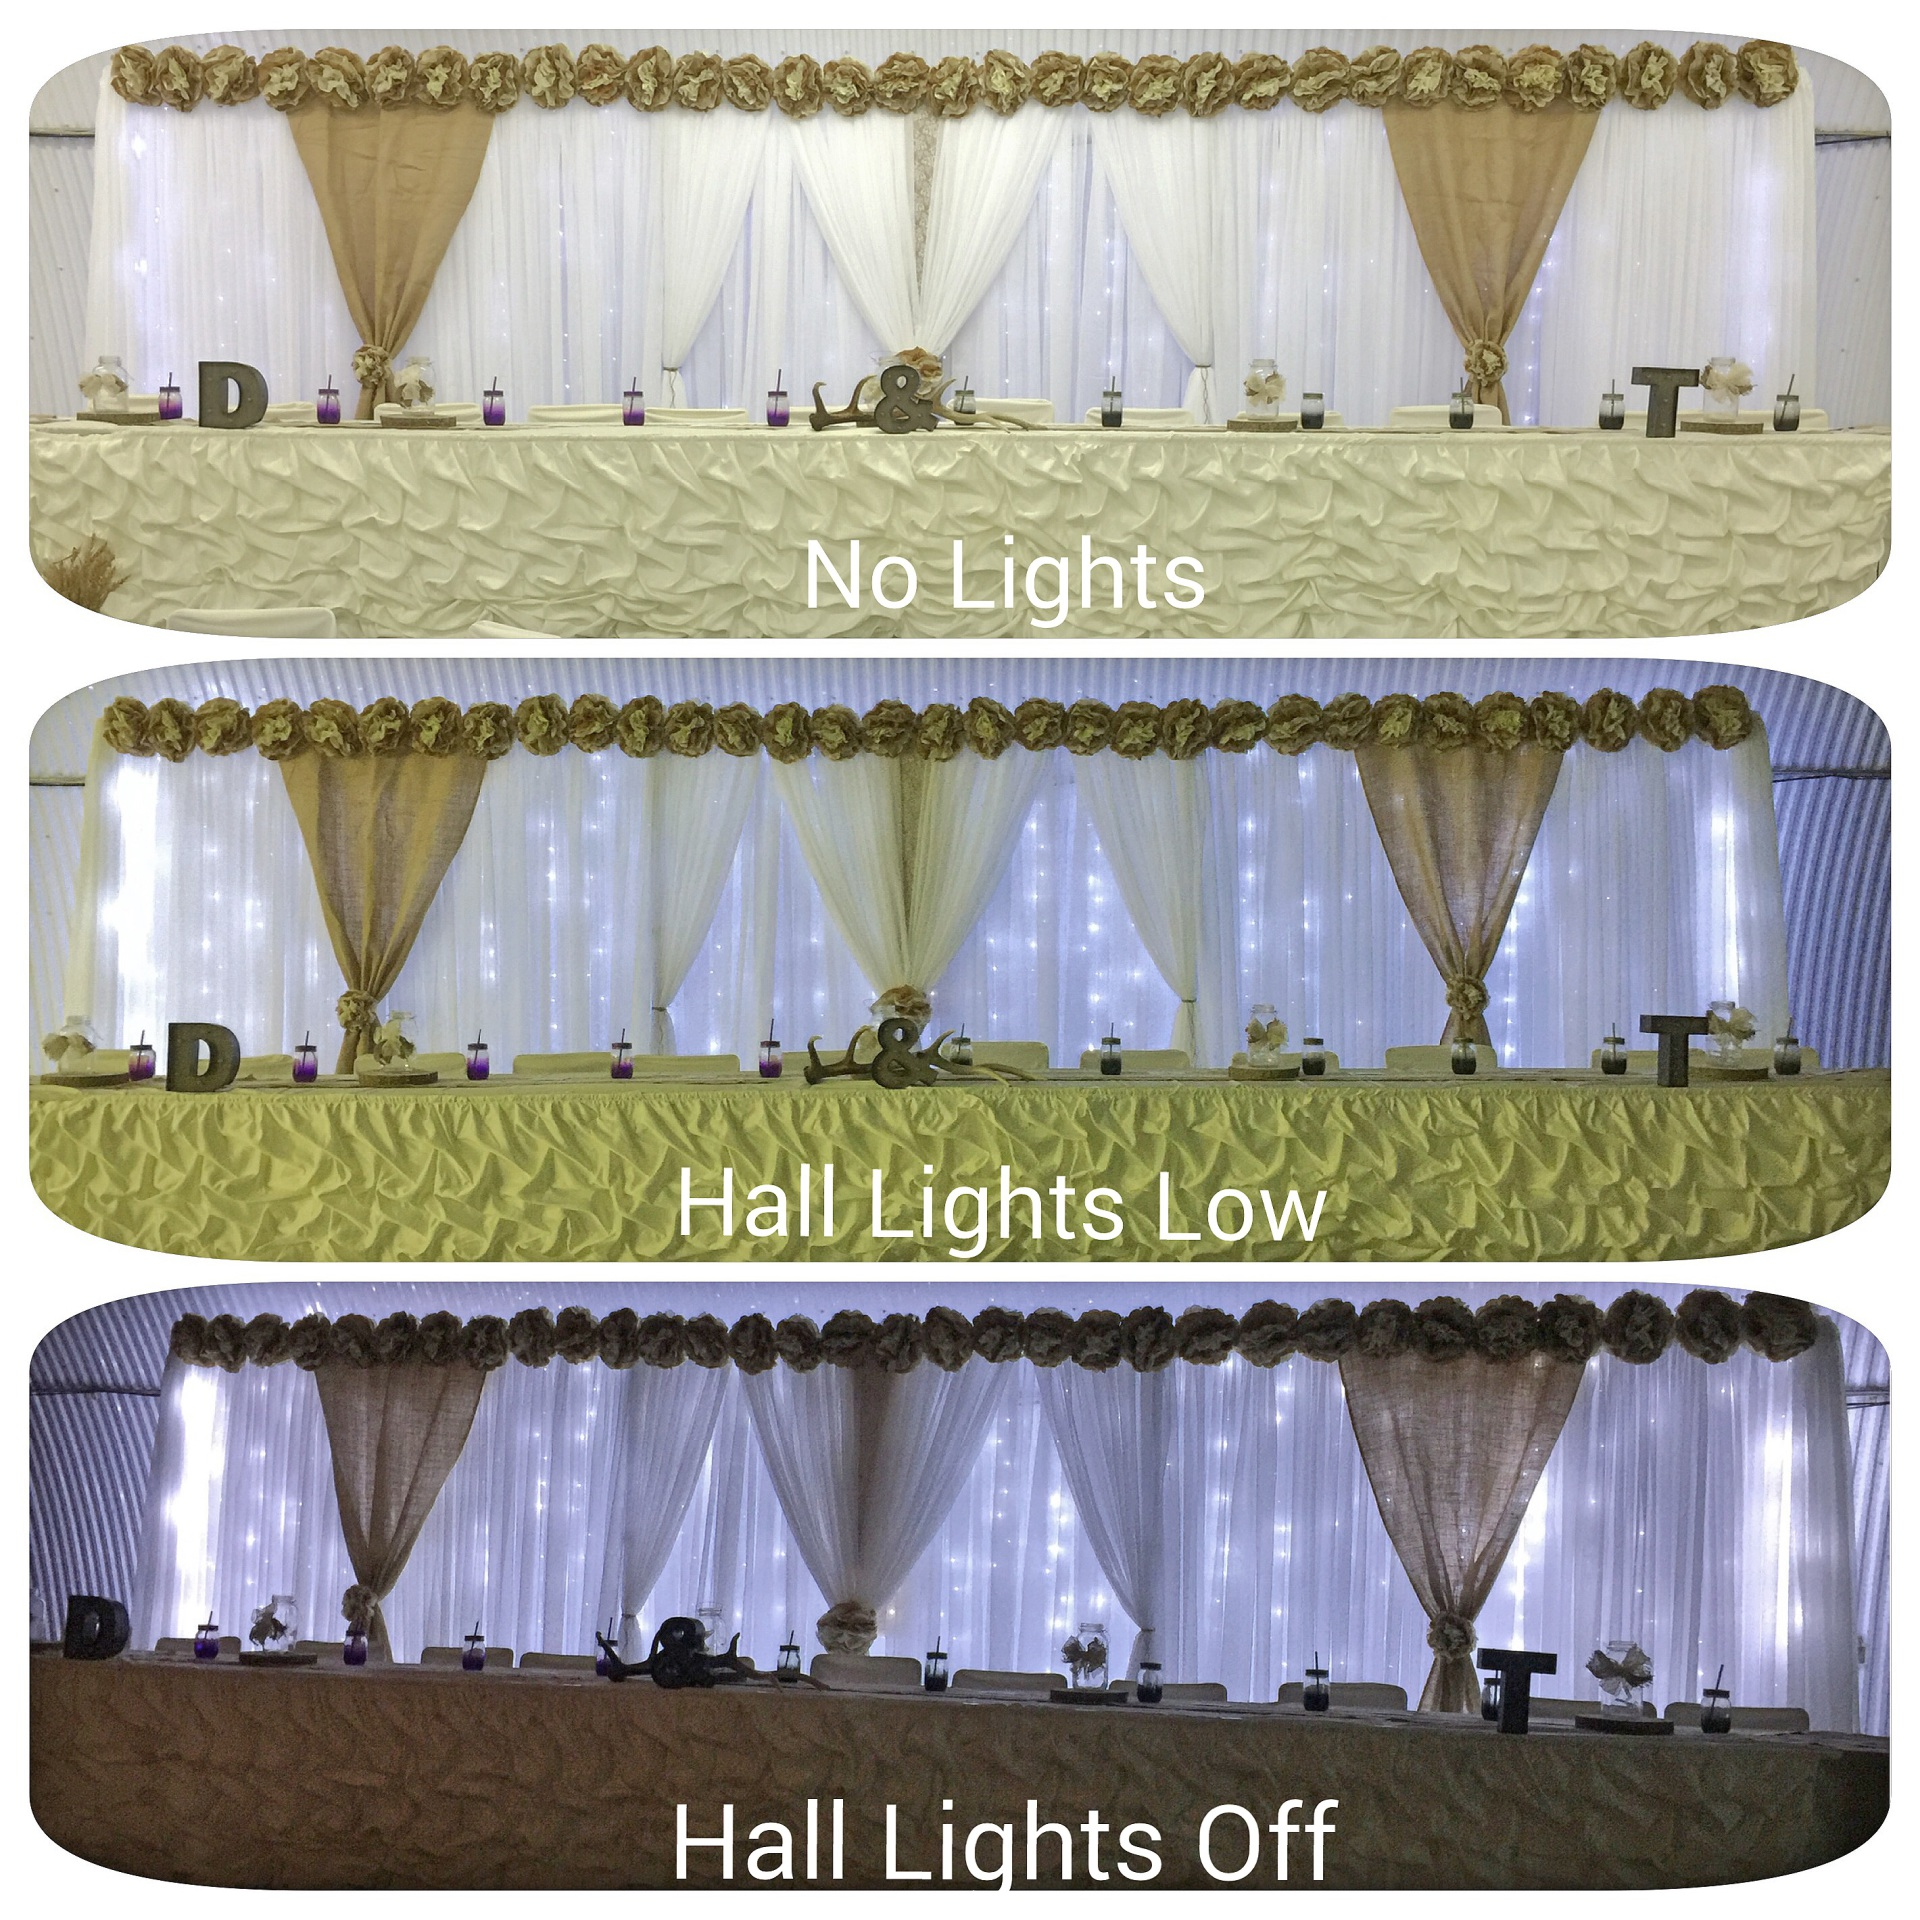 Shades of lights